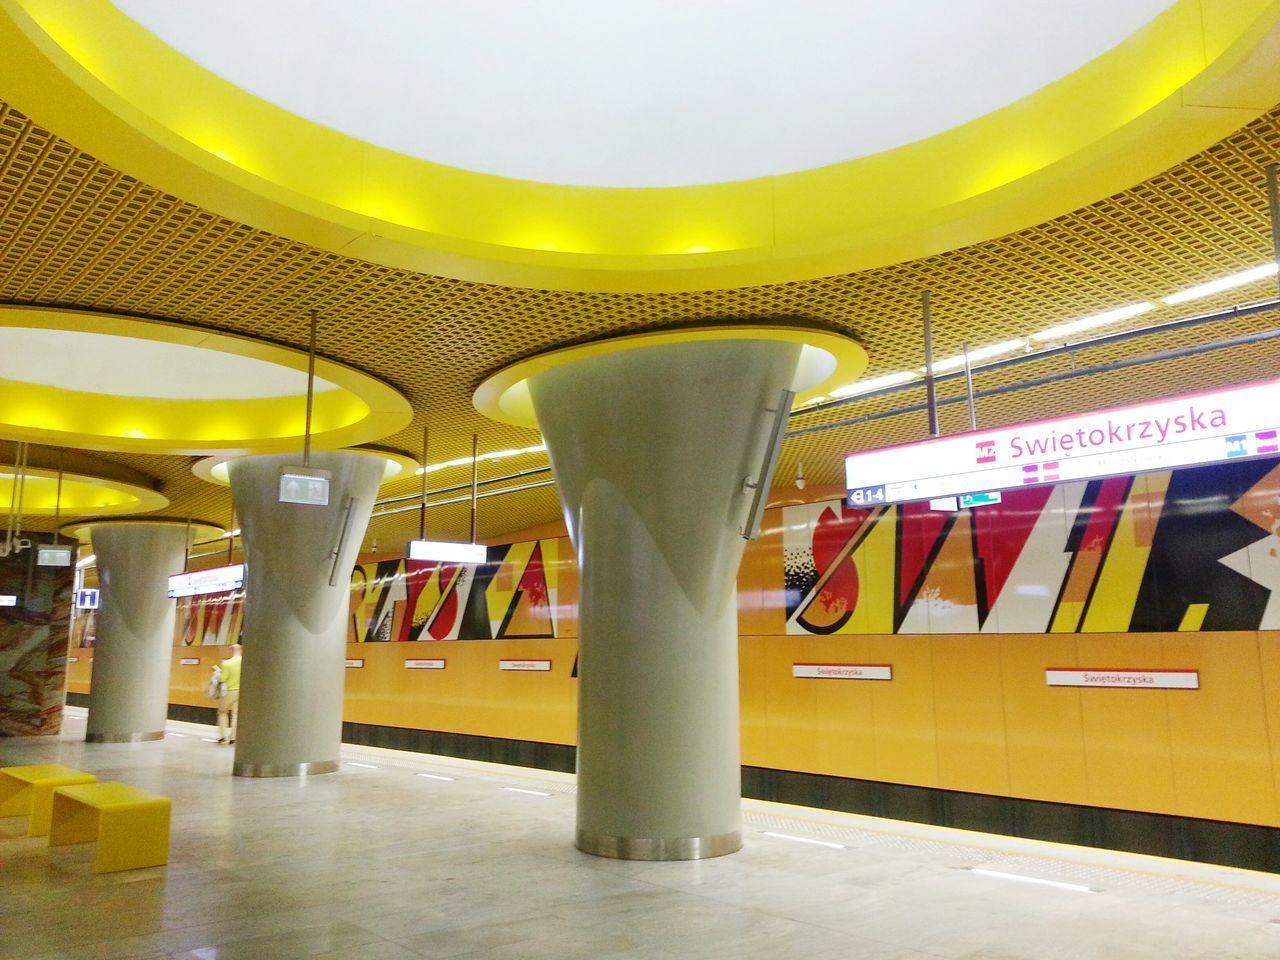 ceiling, illuminated, indoors, yellow, subway station, underground, transportation, built structure, architecture, no people, pillar, public transportation, modern, architectural column, day